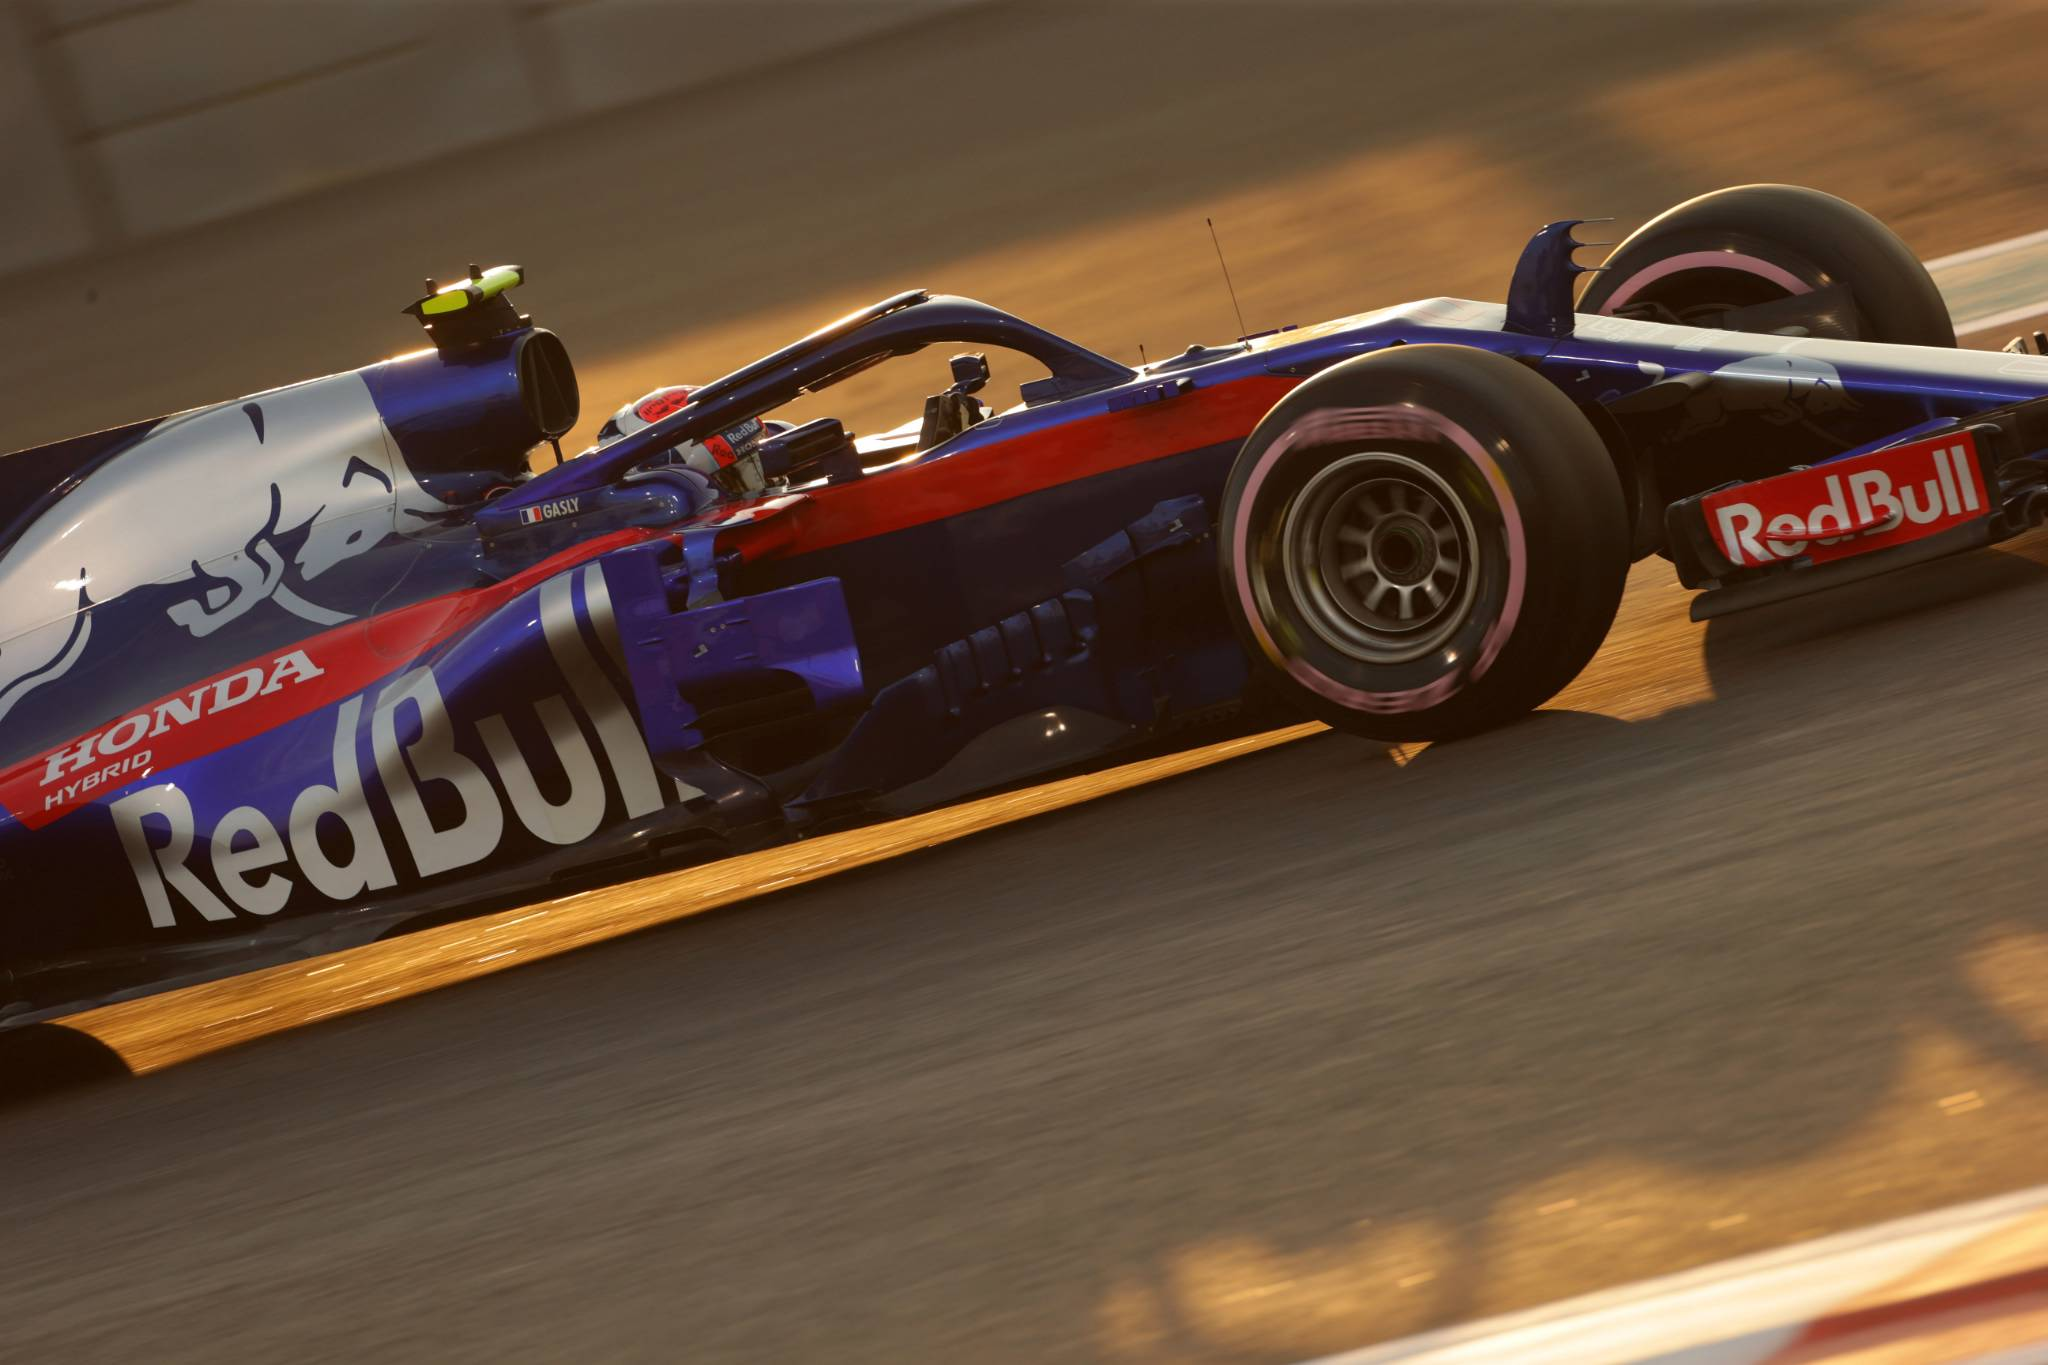 24.11.2018 - Qualifying, Pierre Gasly (FRA) Scuderia Toro Rosso STR13